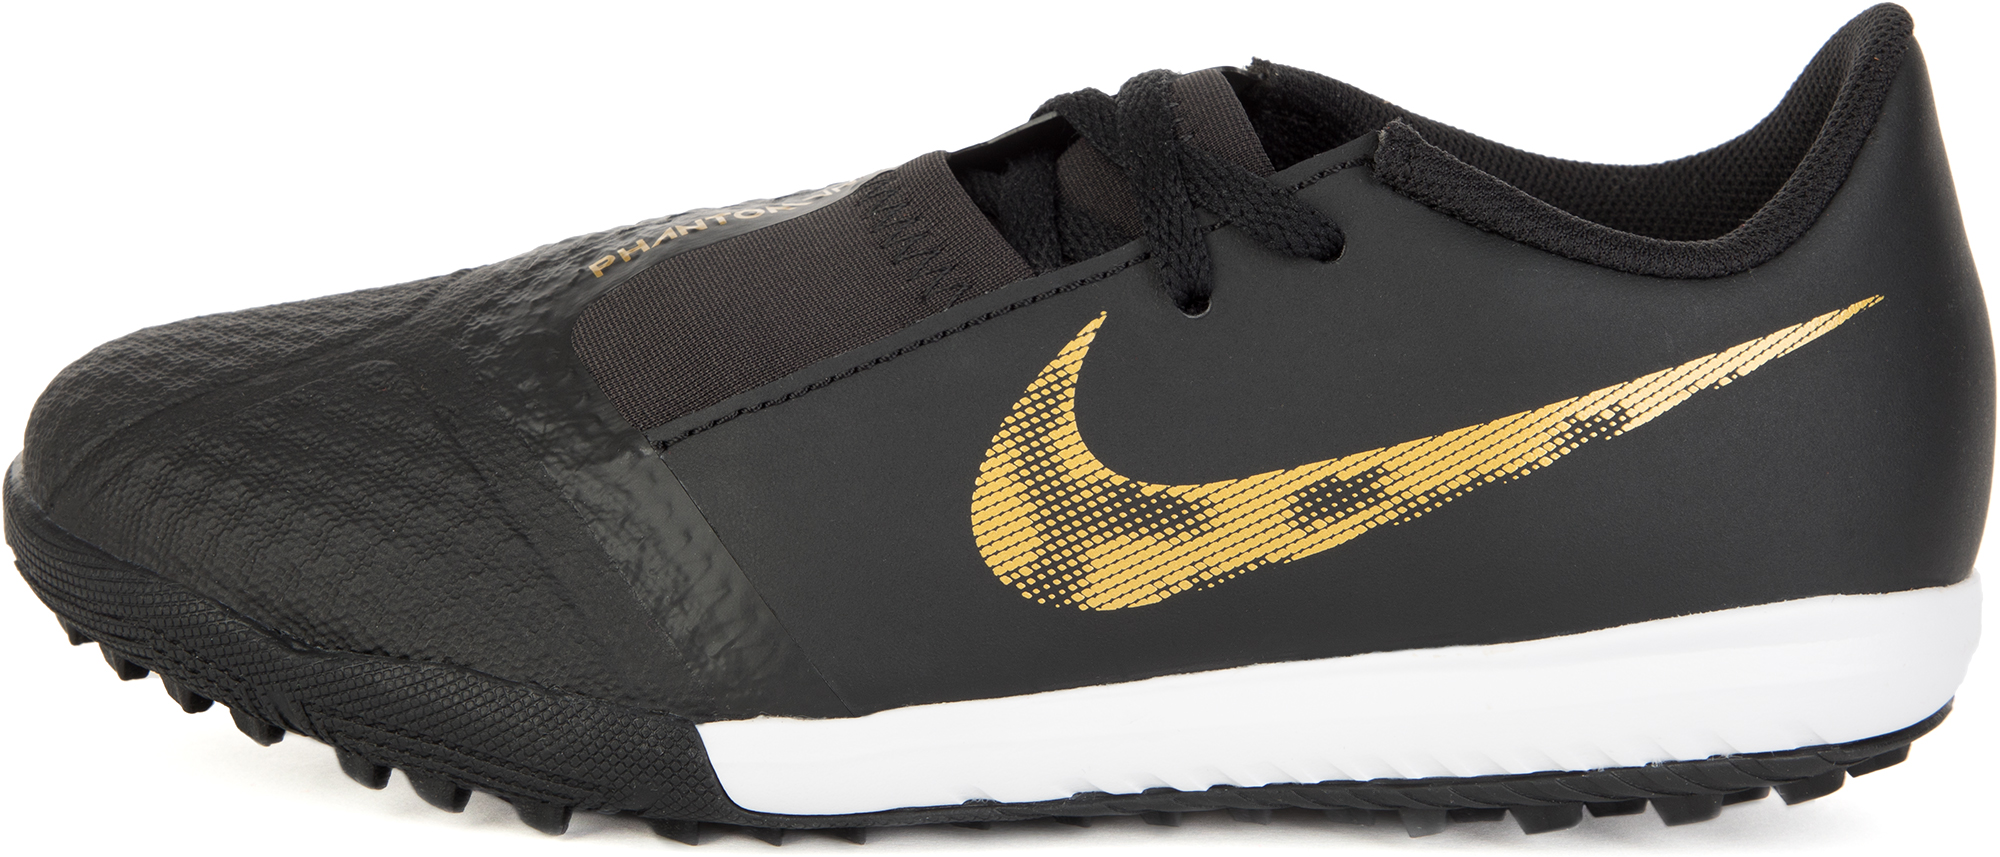 Nike Бутсы для мальчиков Nike Phantom Venom Academy TF, размер 37,5 цена 2017